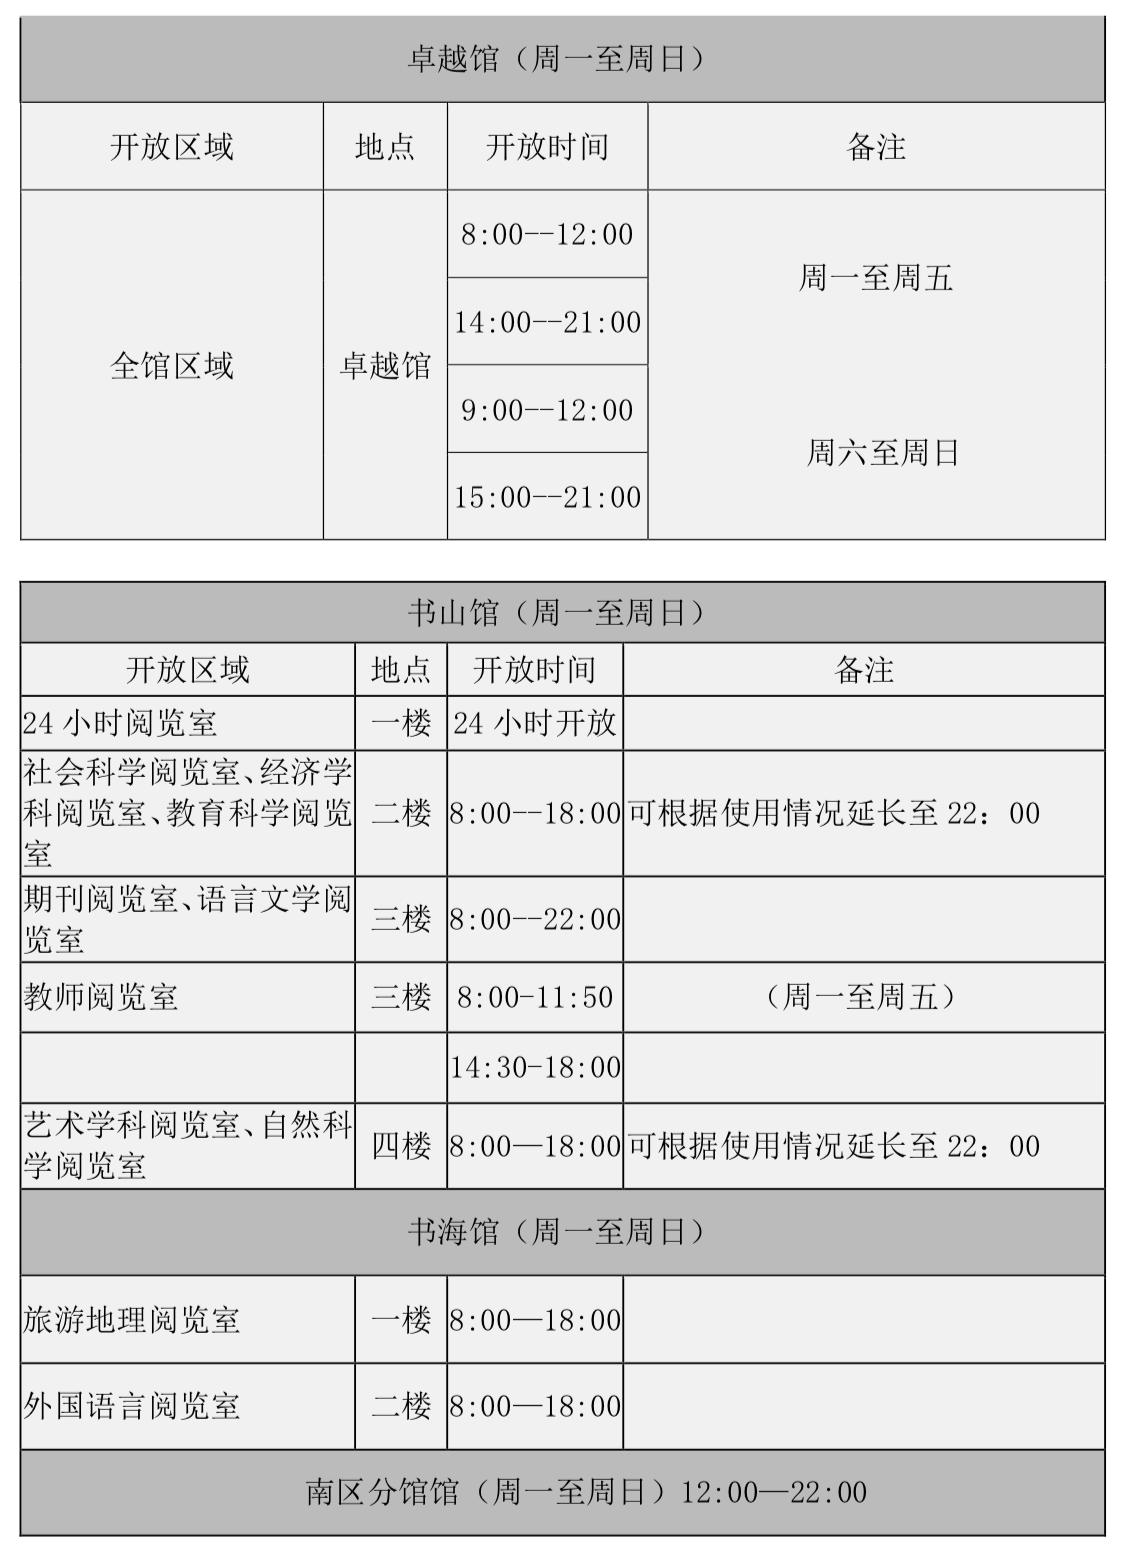 屏幕快照 2019-04-25 13.53.34.png